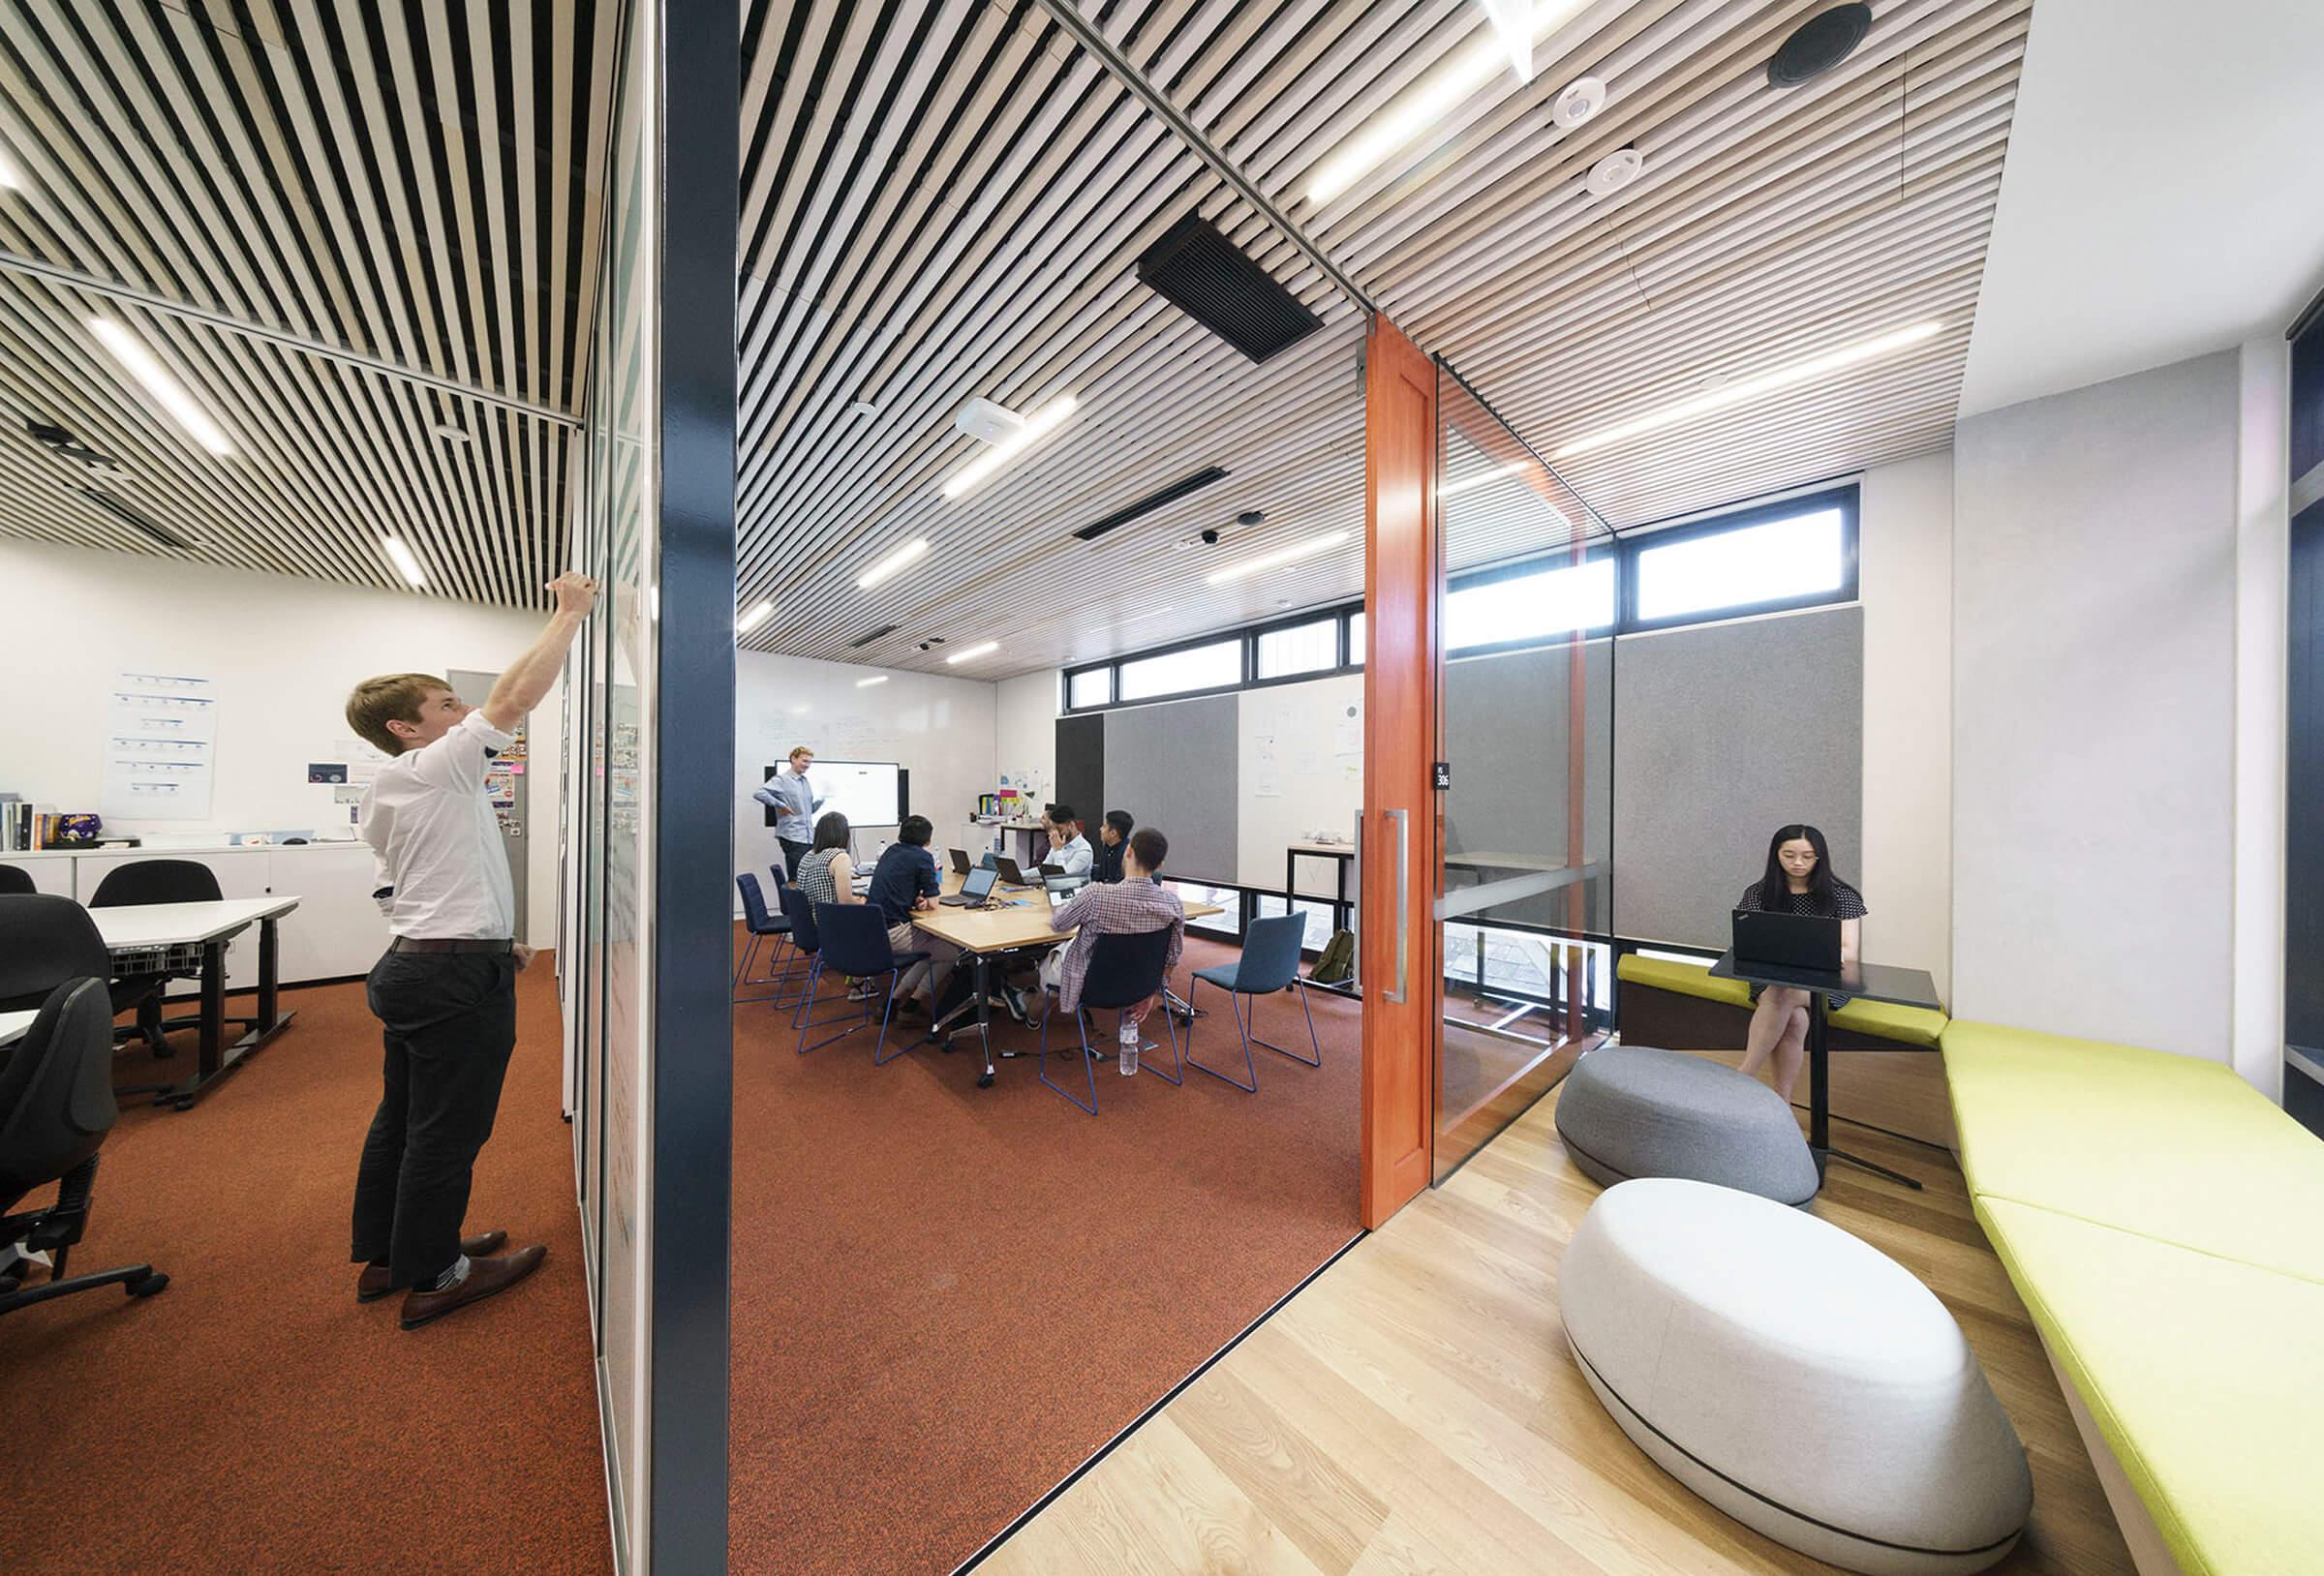 Swinburne University Innovation and Design Hub